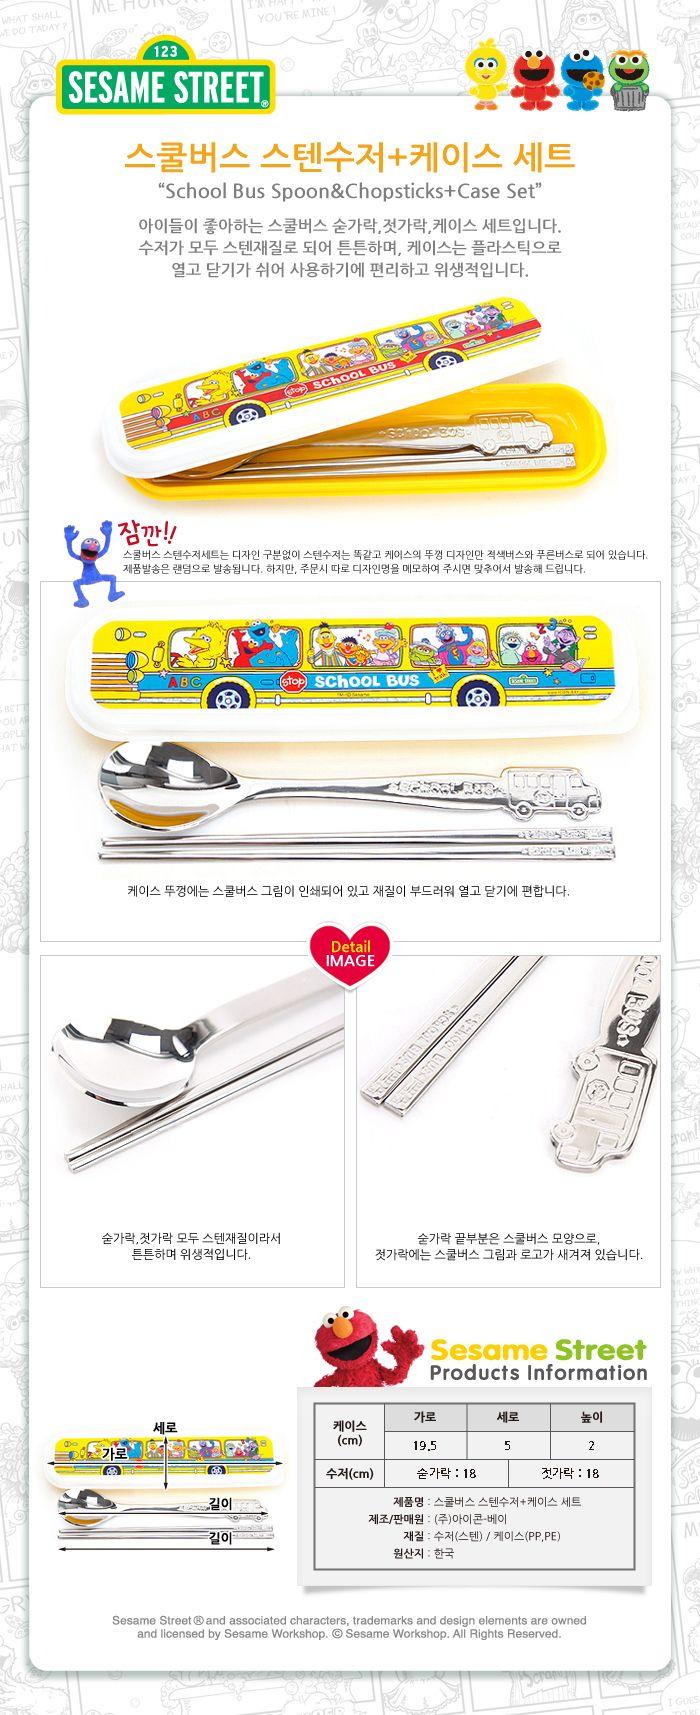 School Bus Spoon&Chopsticks Case Set